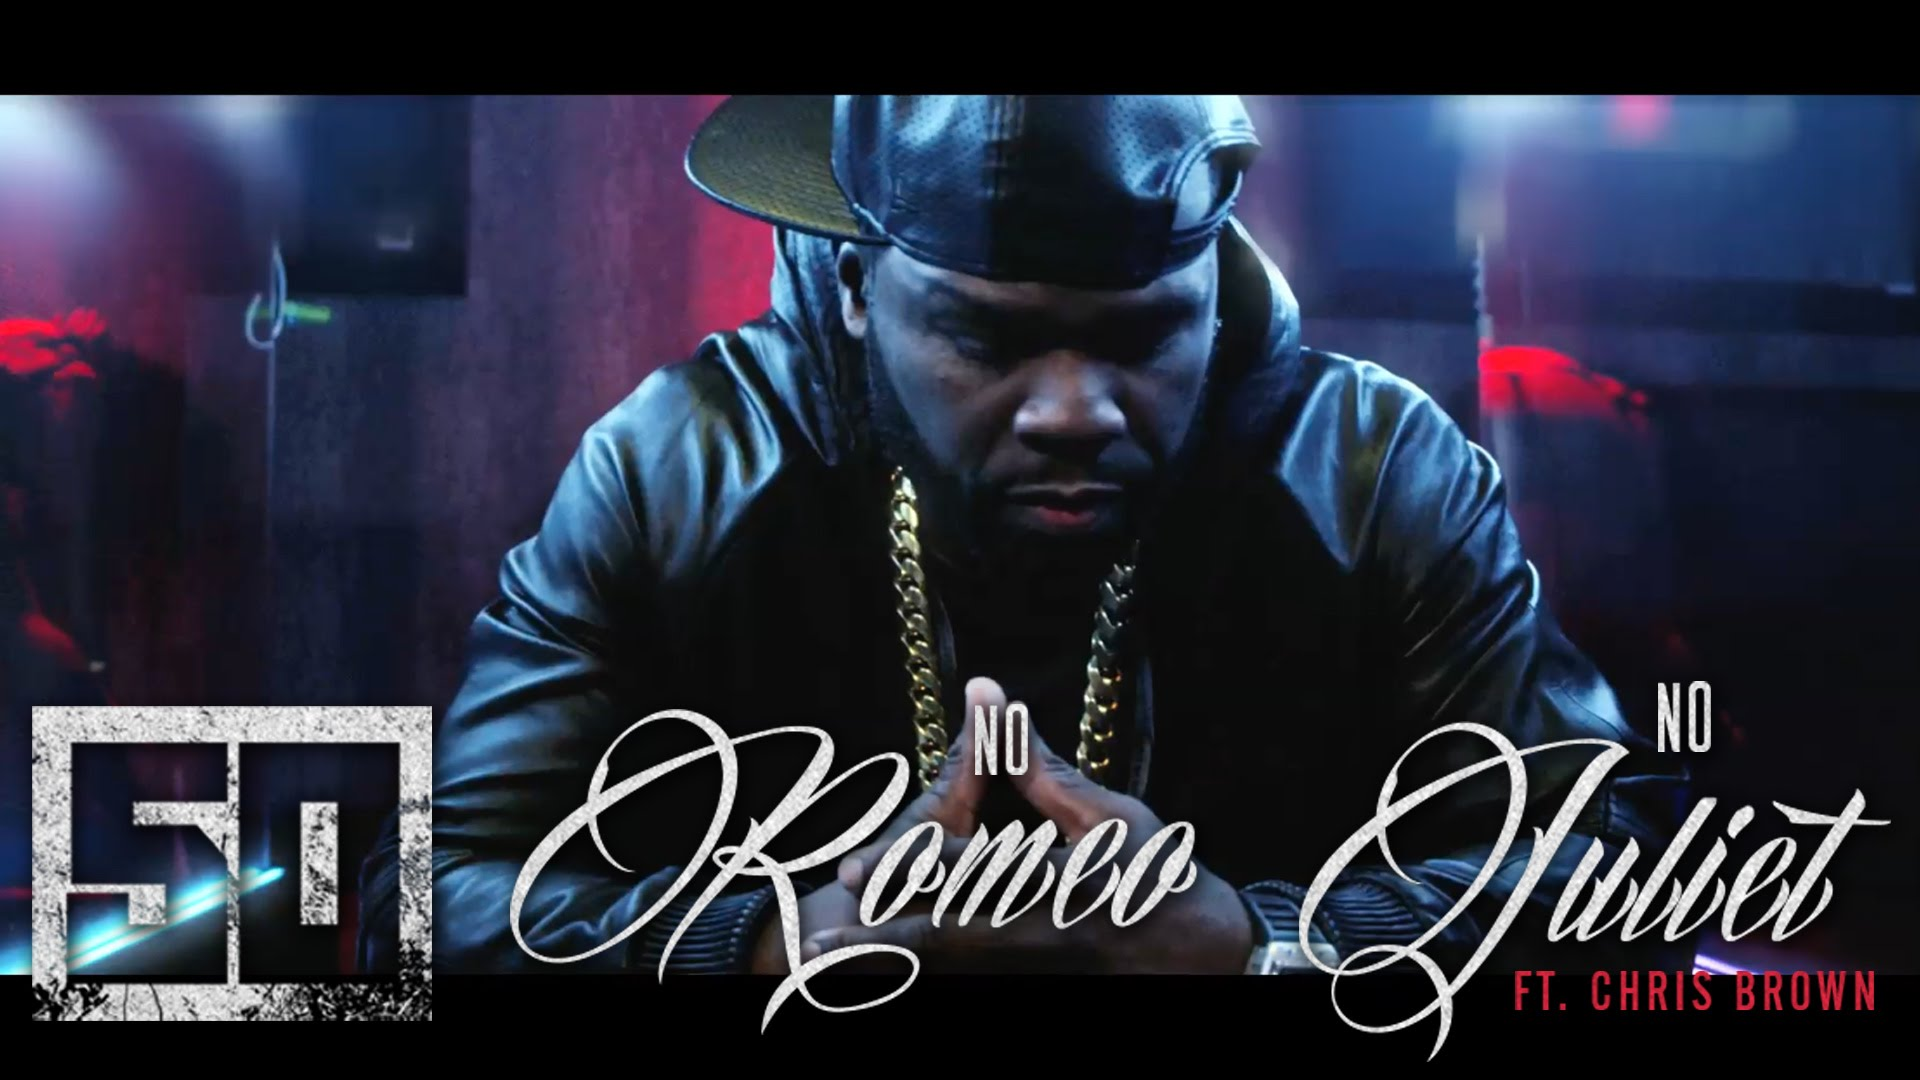 c372a668bb5214 50 Cent - No Romeo No Juliet ft. Chris Brown (Official Music Video ...